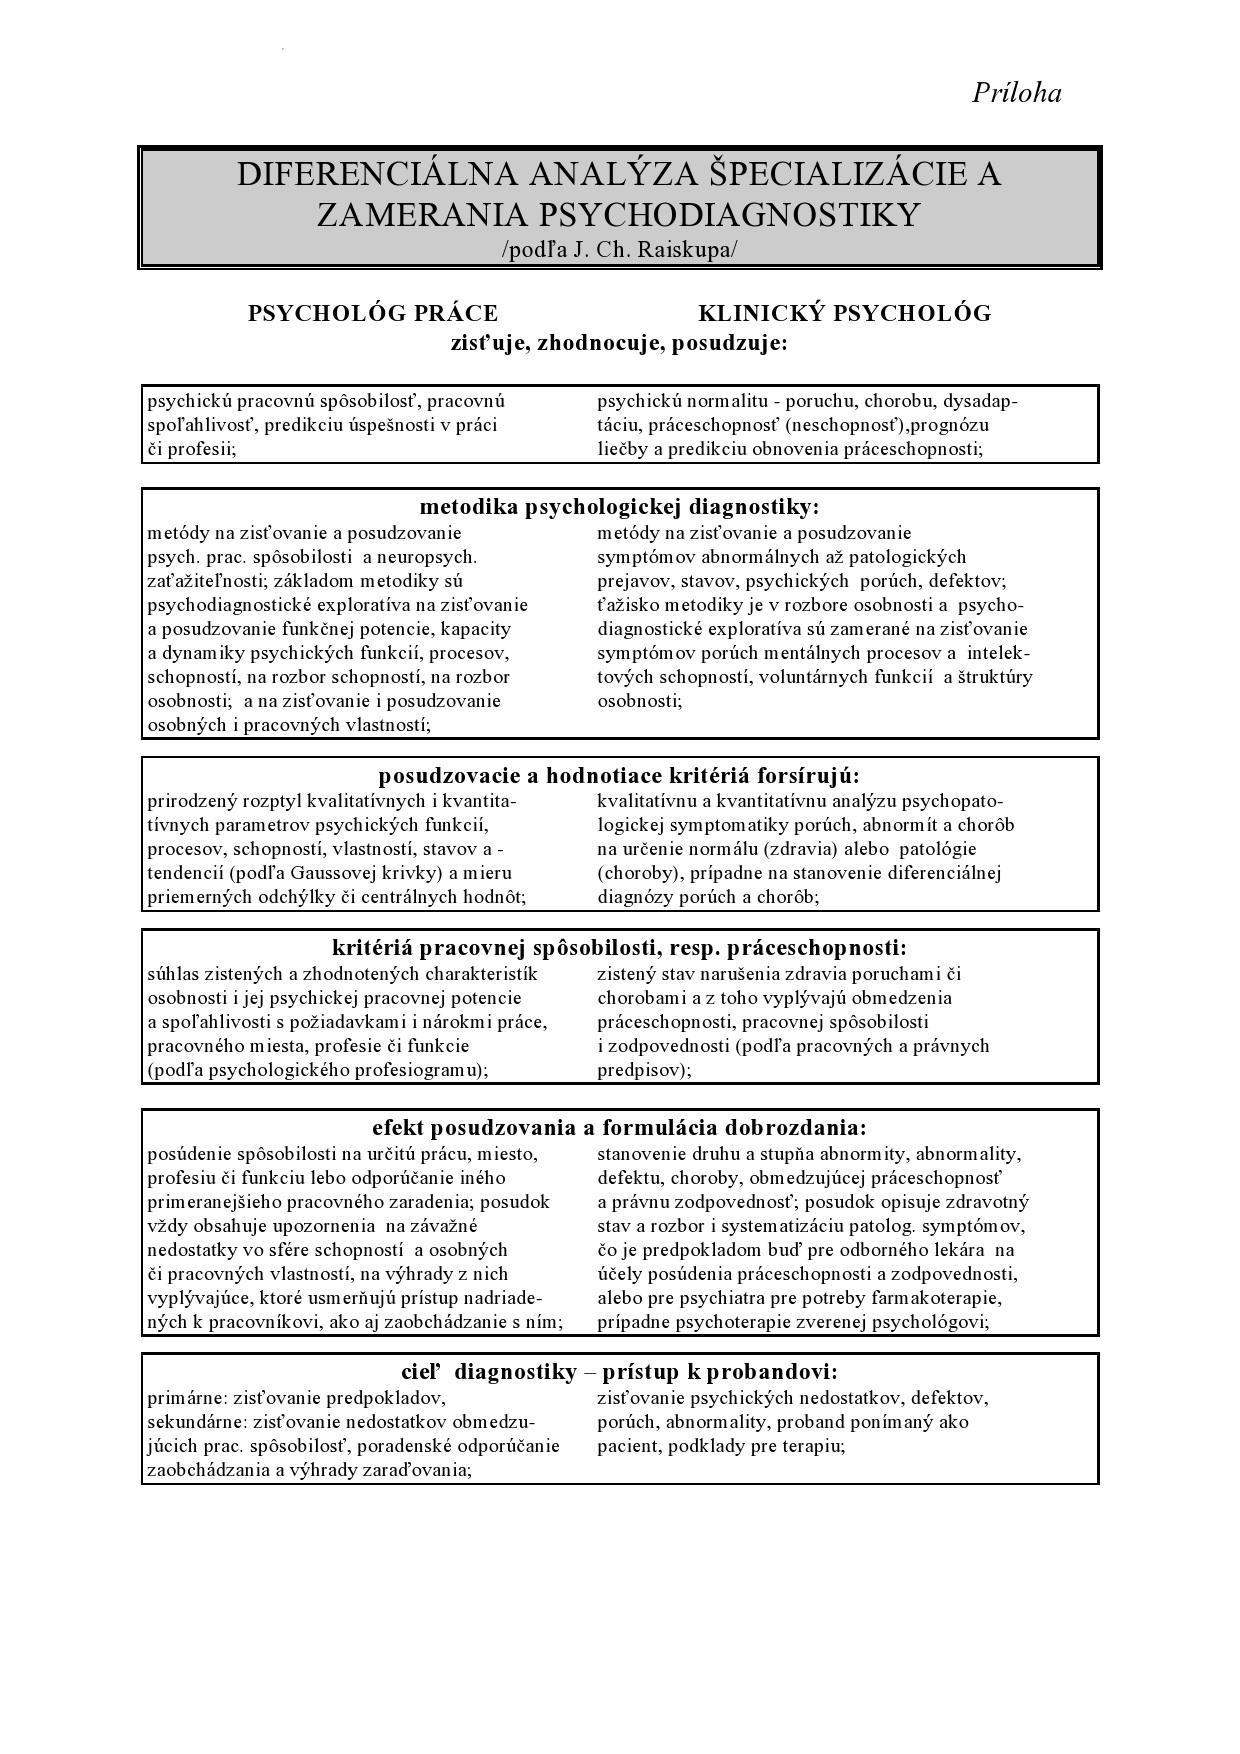 priloha_raiskup-page0001.jpg